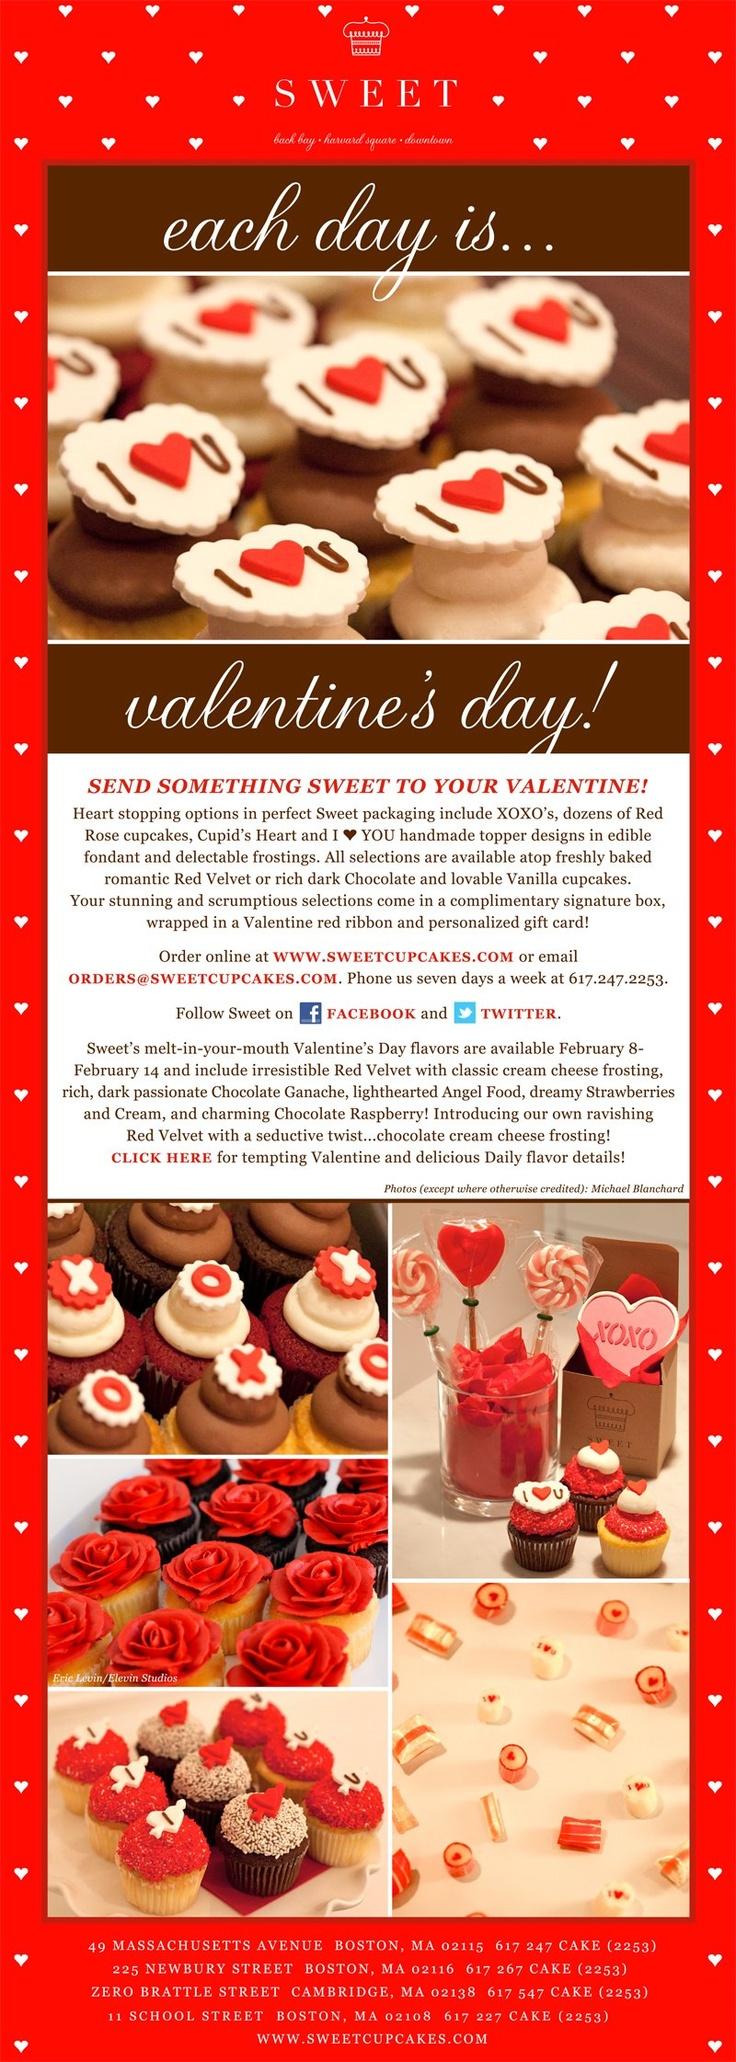 65 best Valentines day images on Pinterest  Valentine day